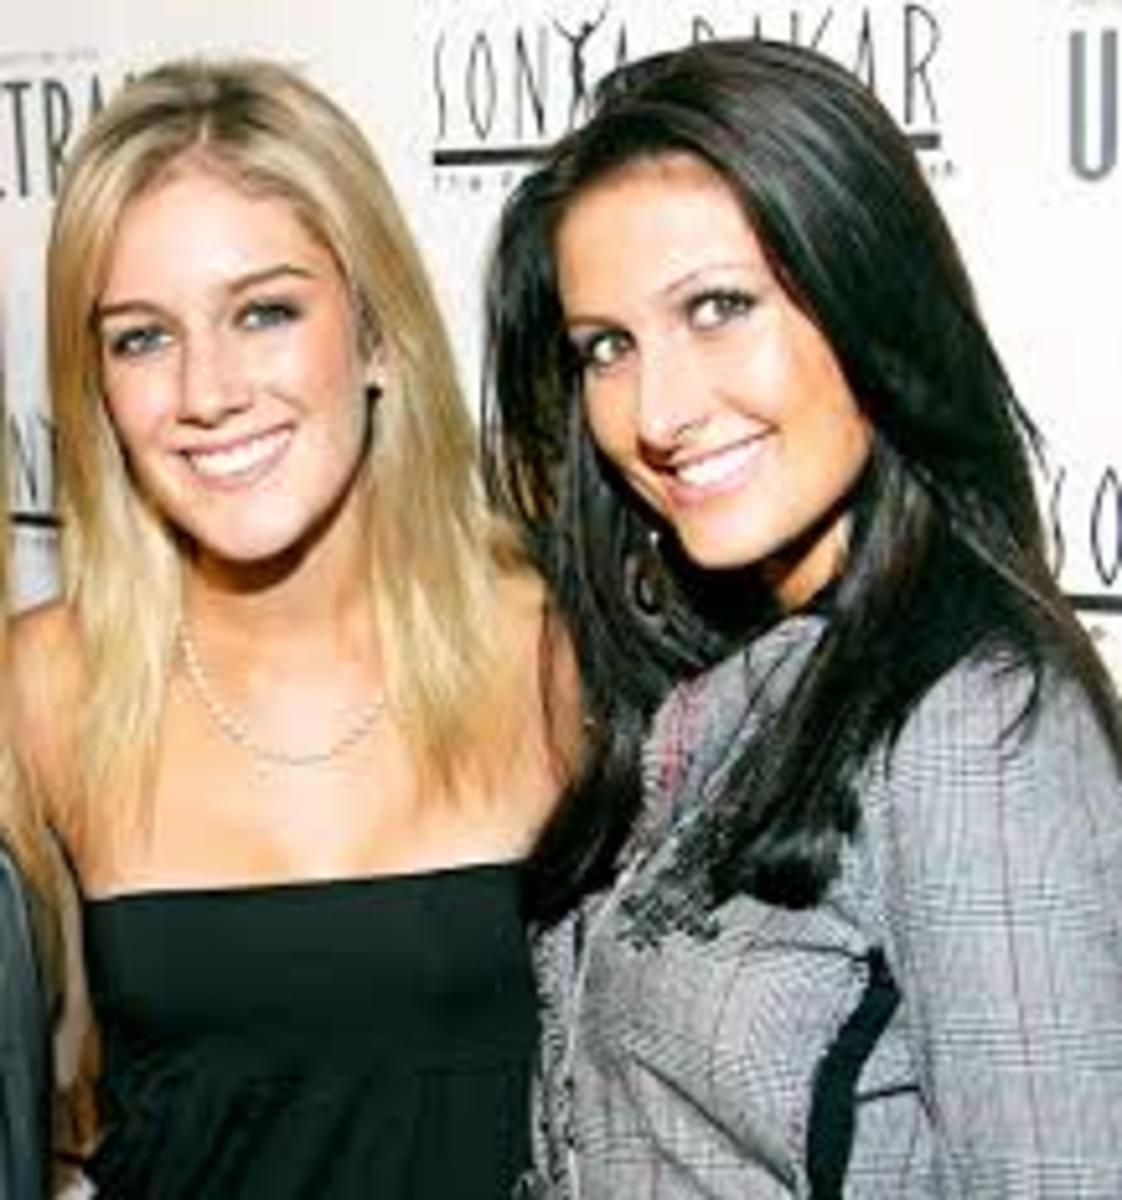 Heidi and Jen Bunney